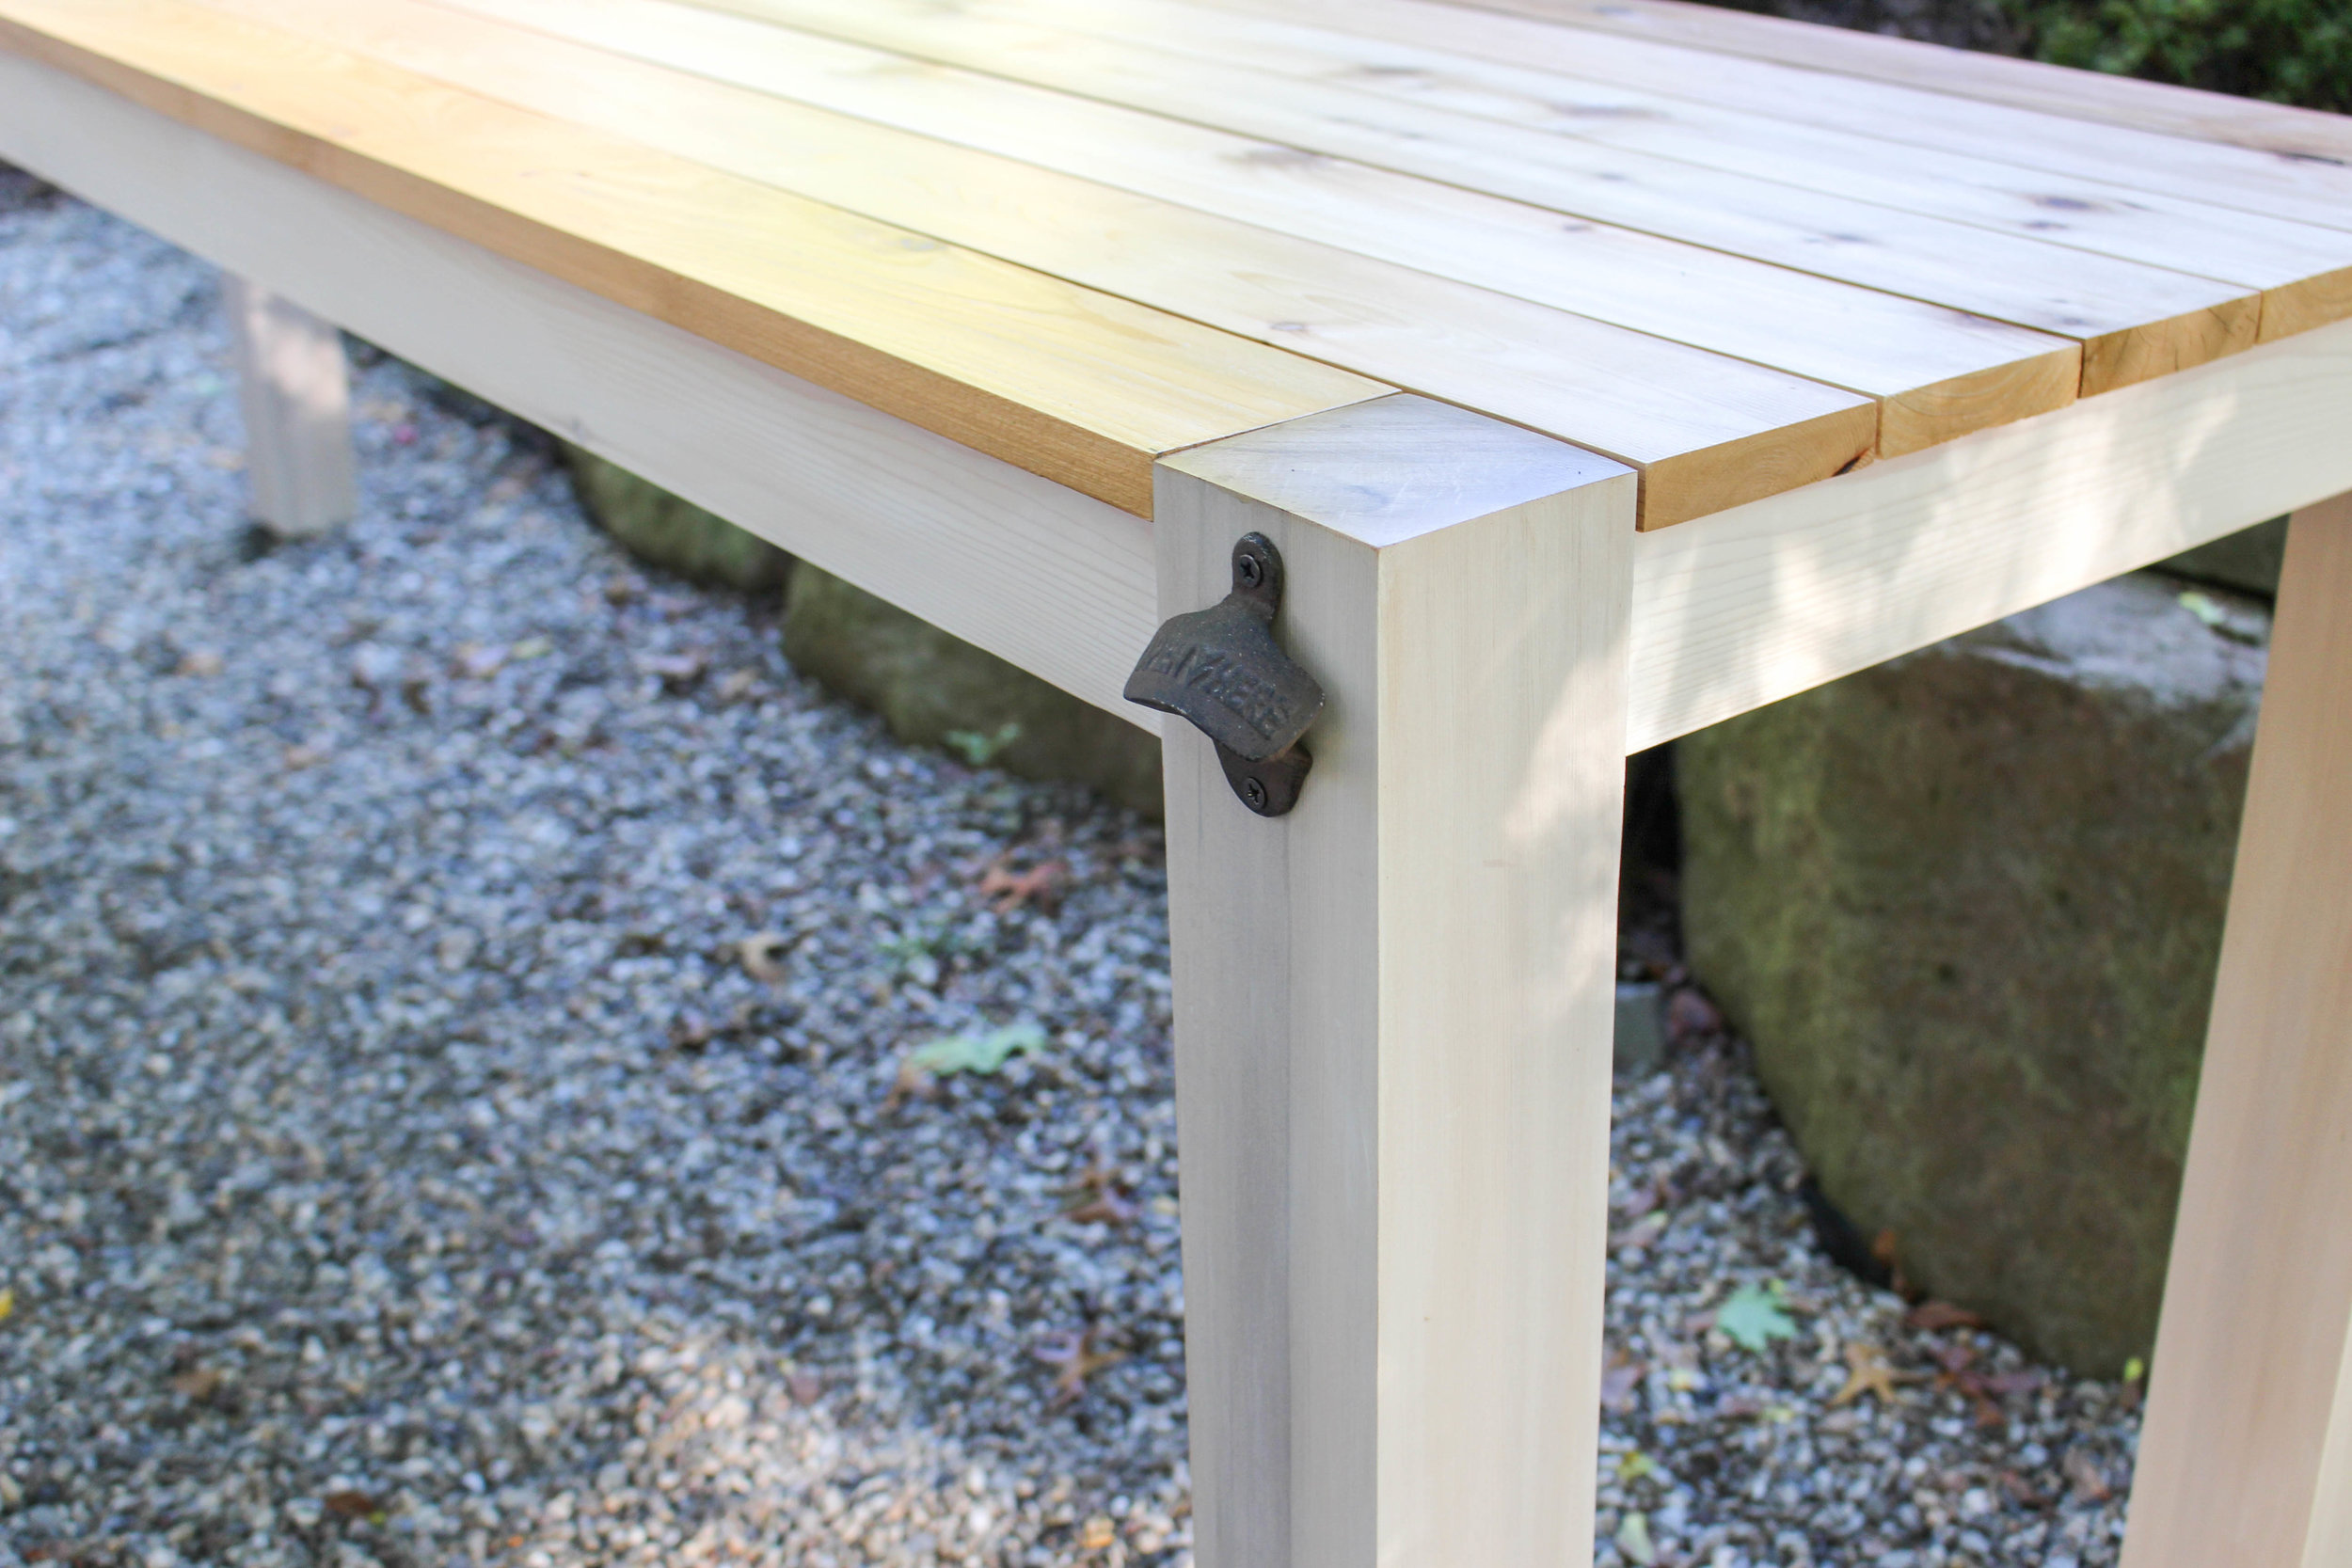 Outdoor Table with Built-In Bottle Opener